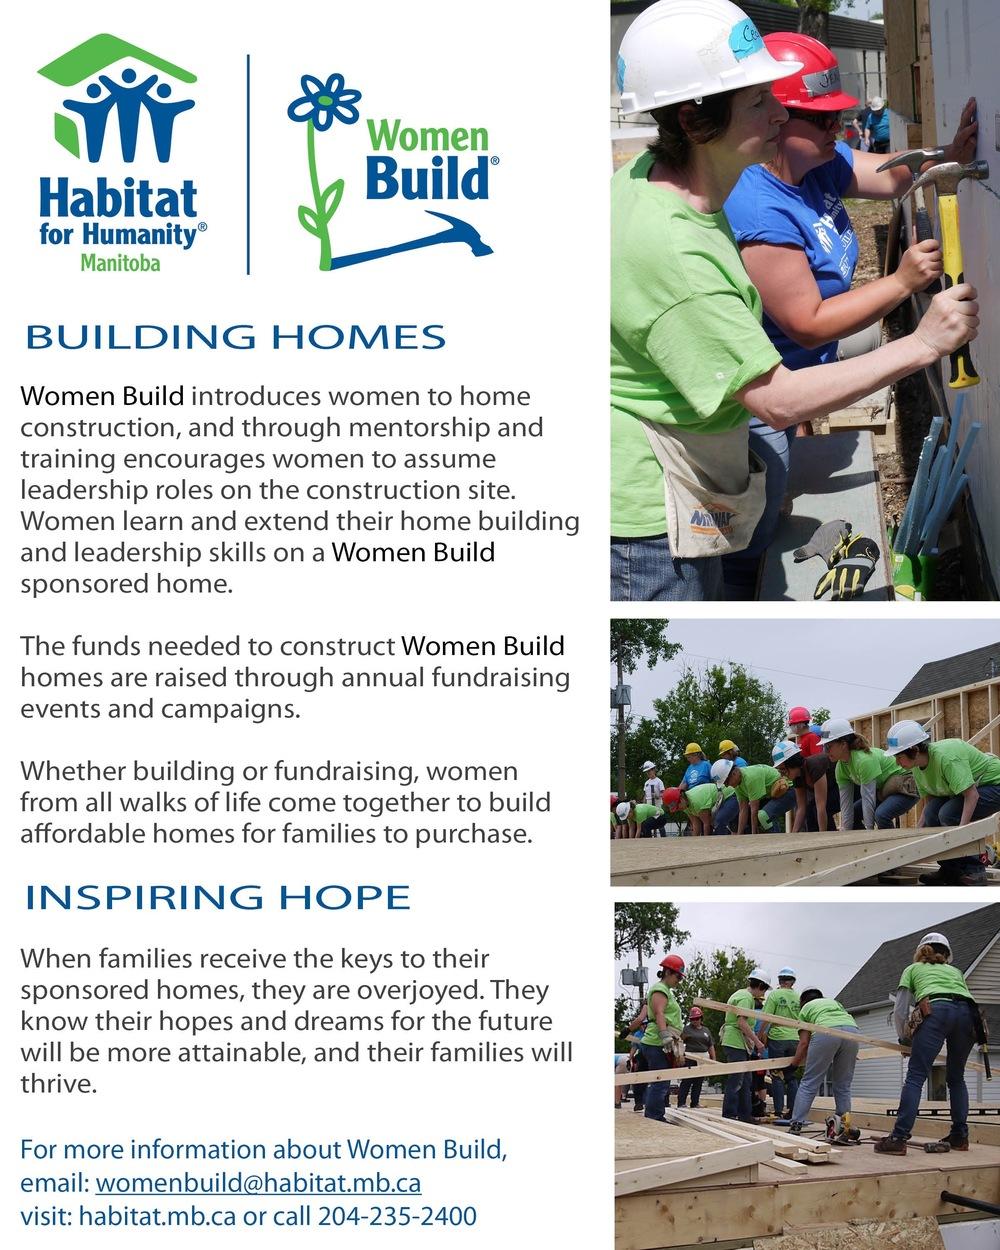 logo_Habitat_for_Humanity.jpg